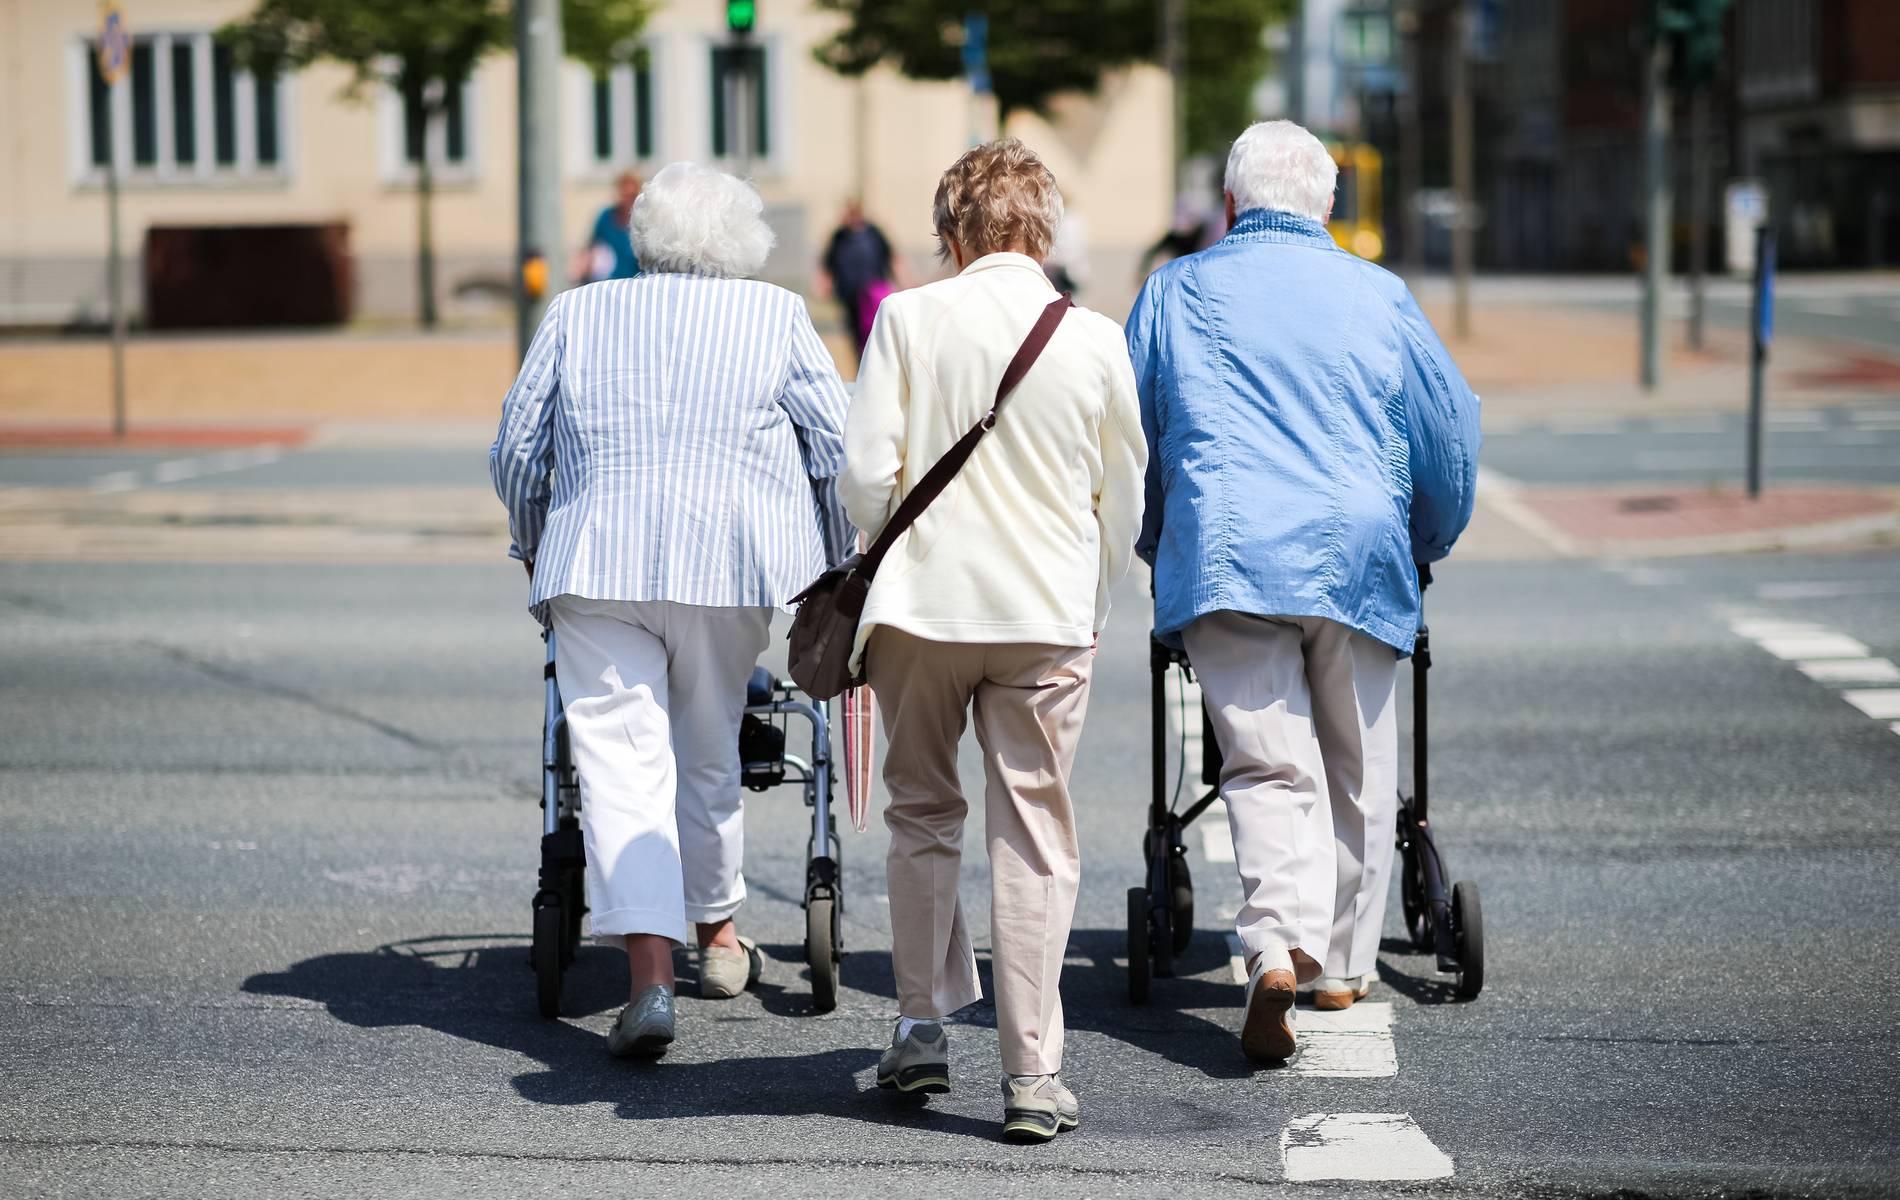 Renten: Bundestag beschließt Rentenerhöhung ab 2019